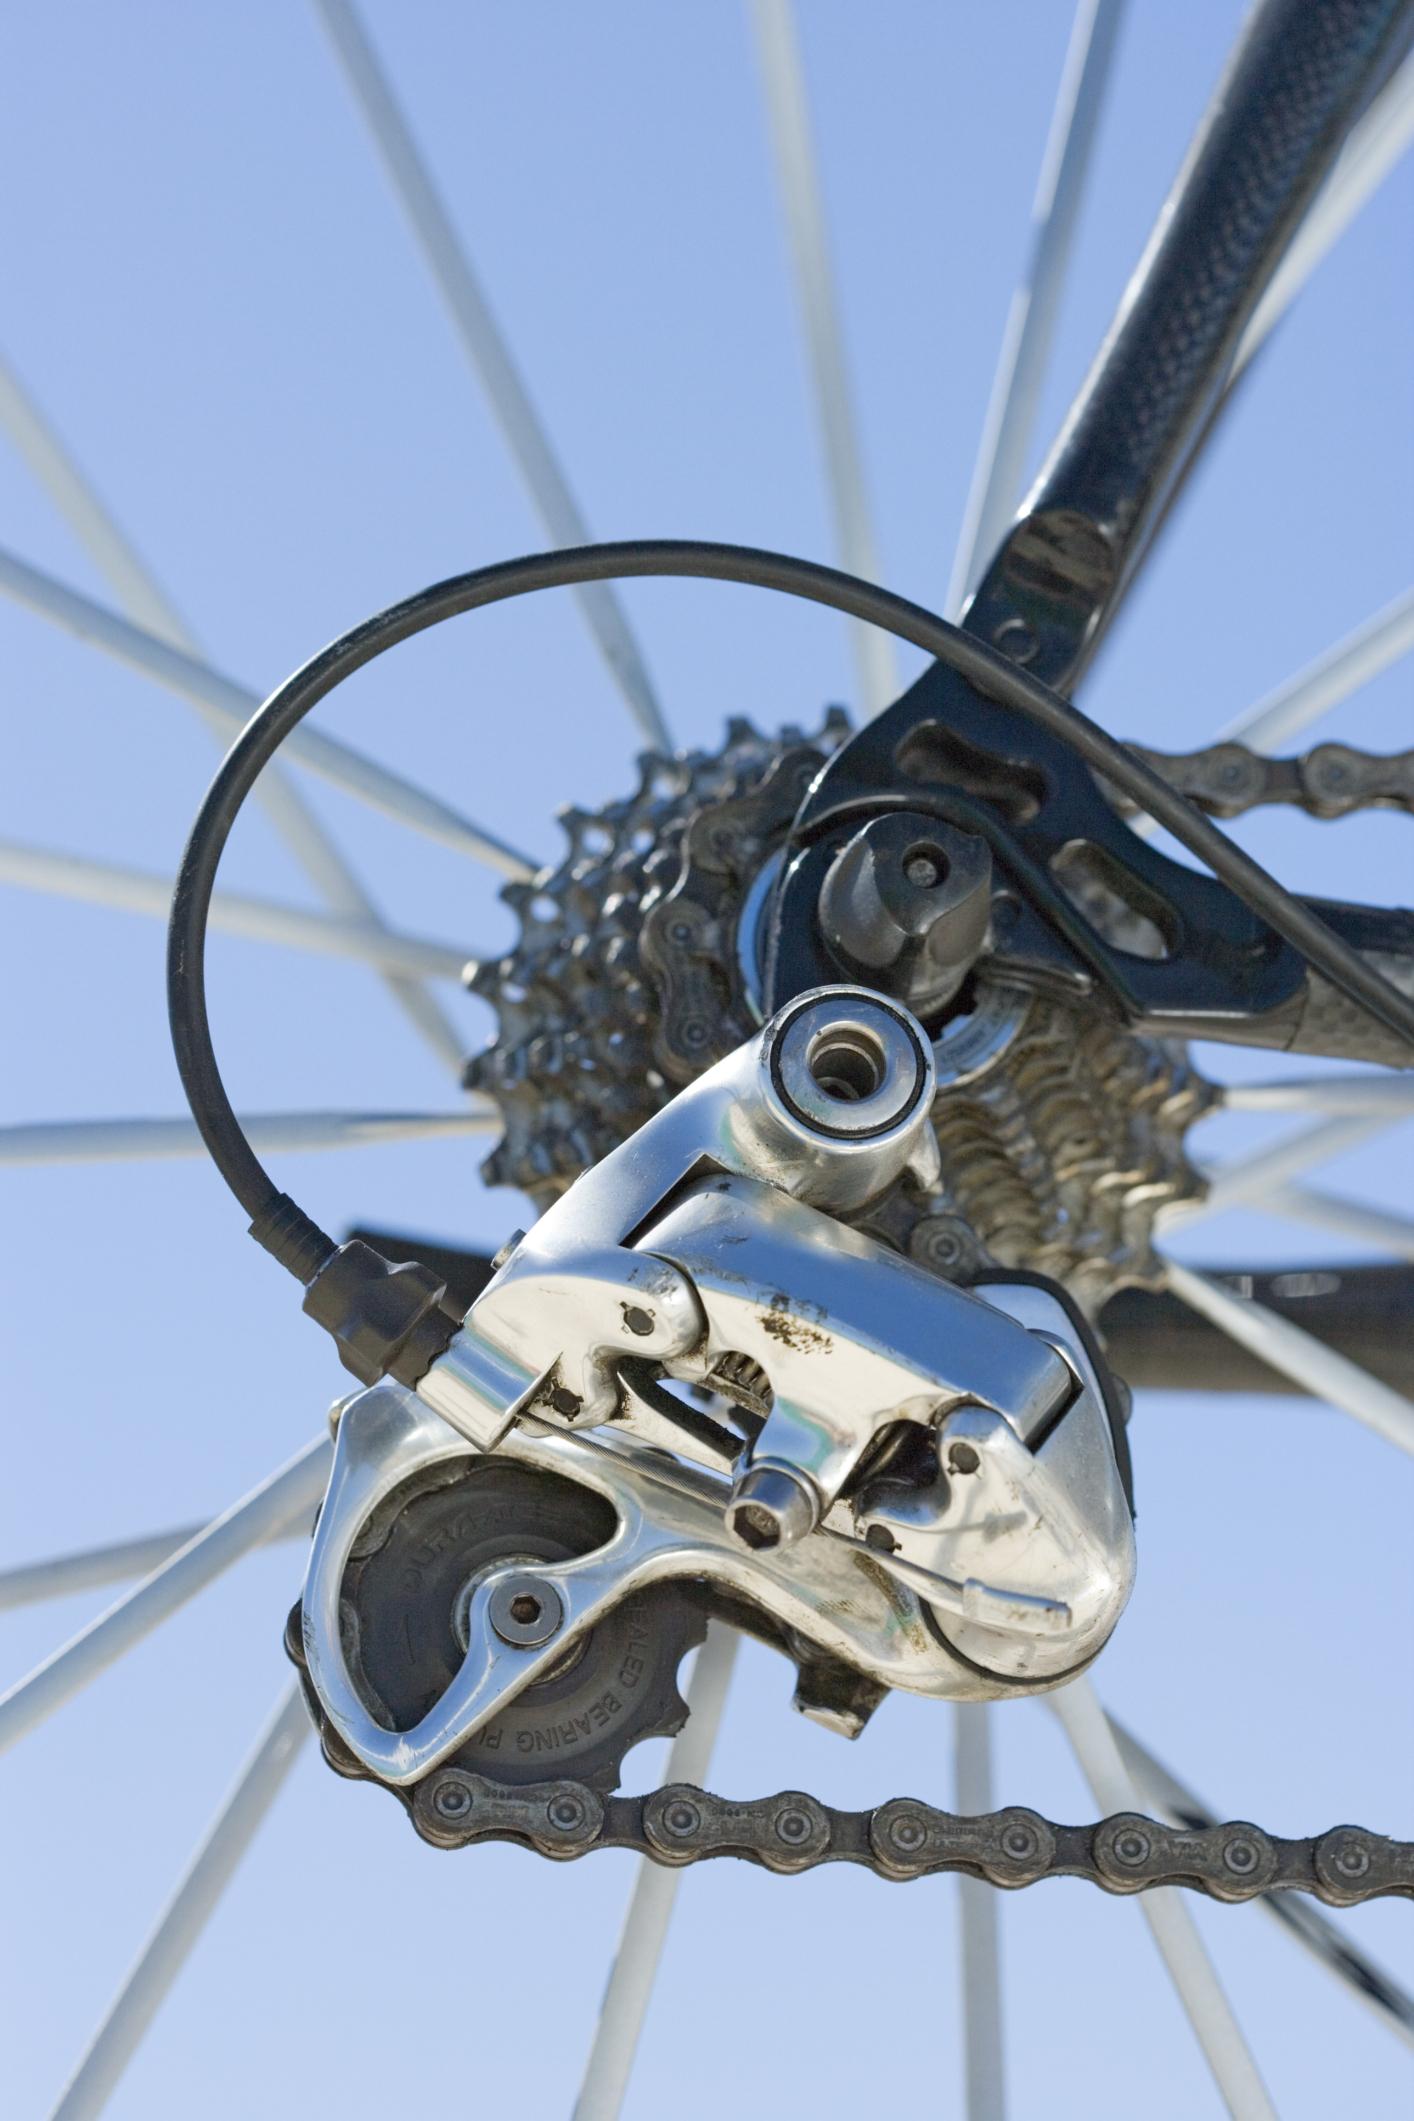 How To Use 21 Speeds On A Bike